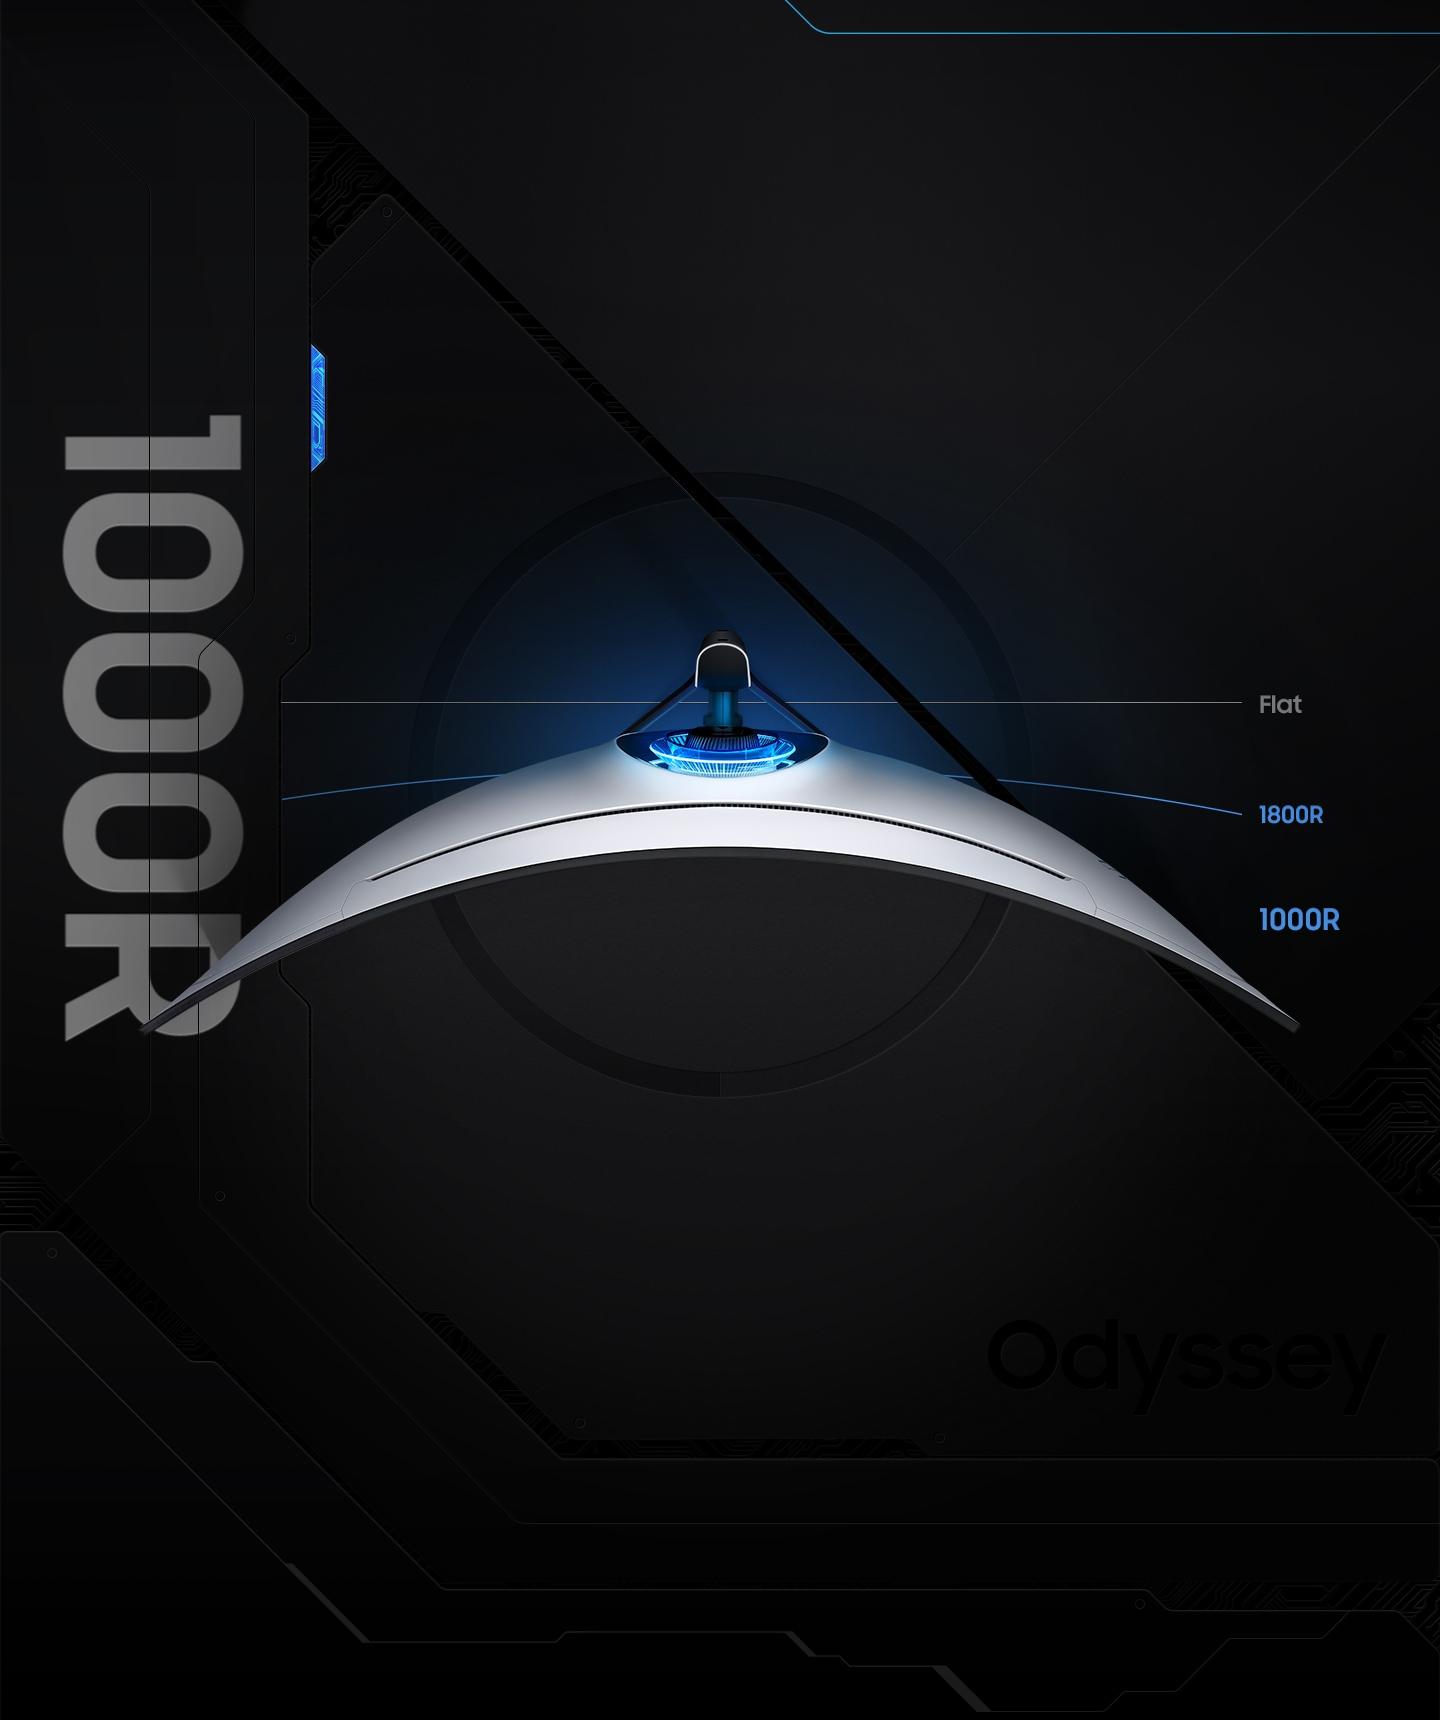 Game-changing 1000R